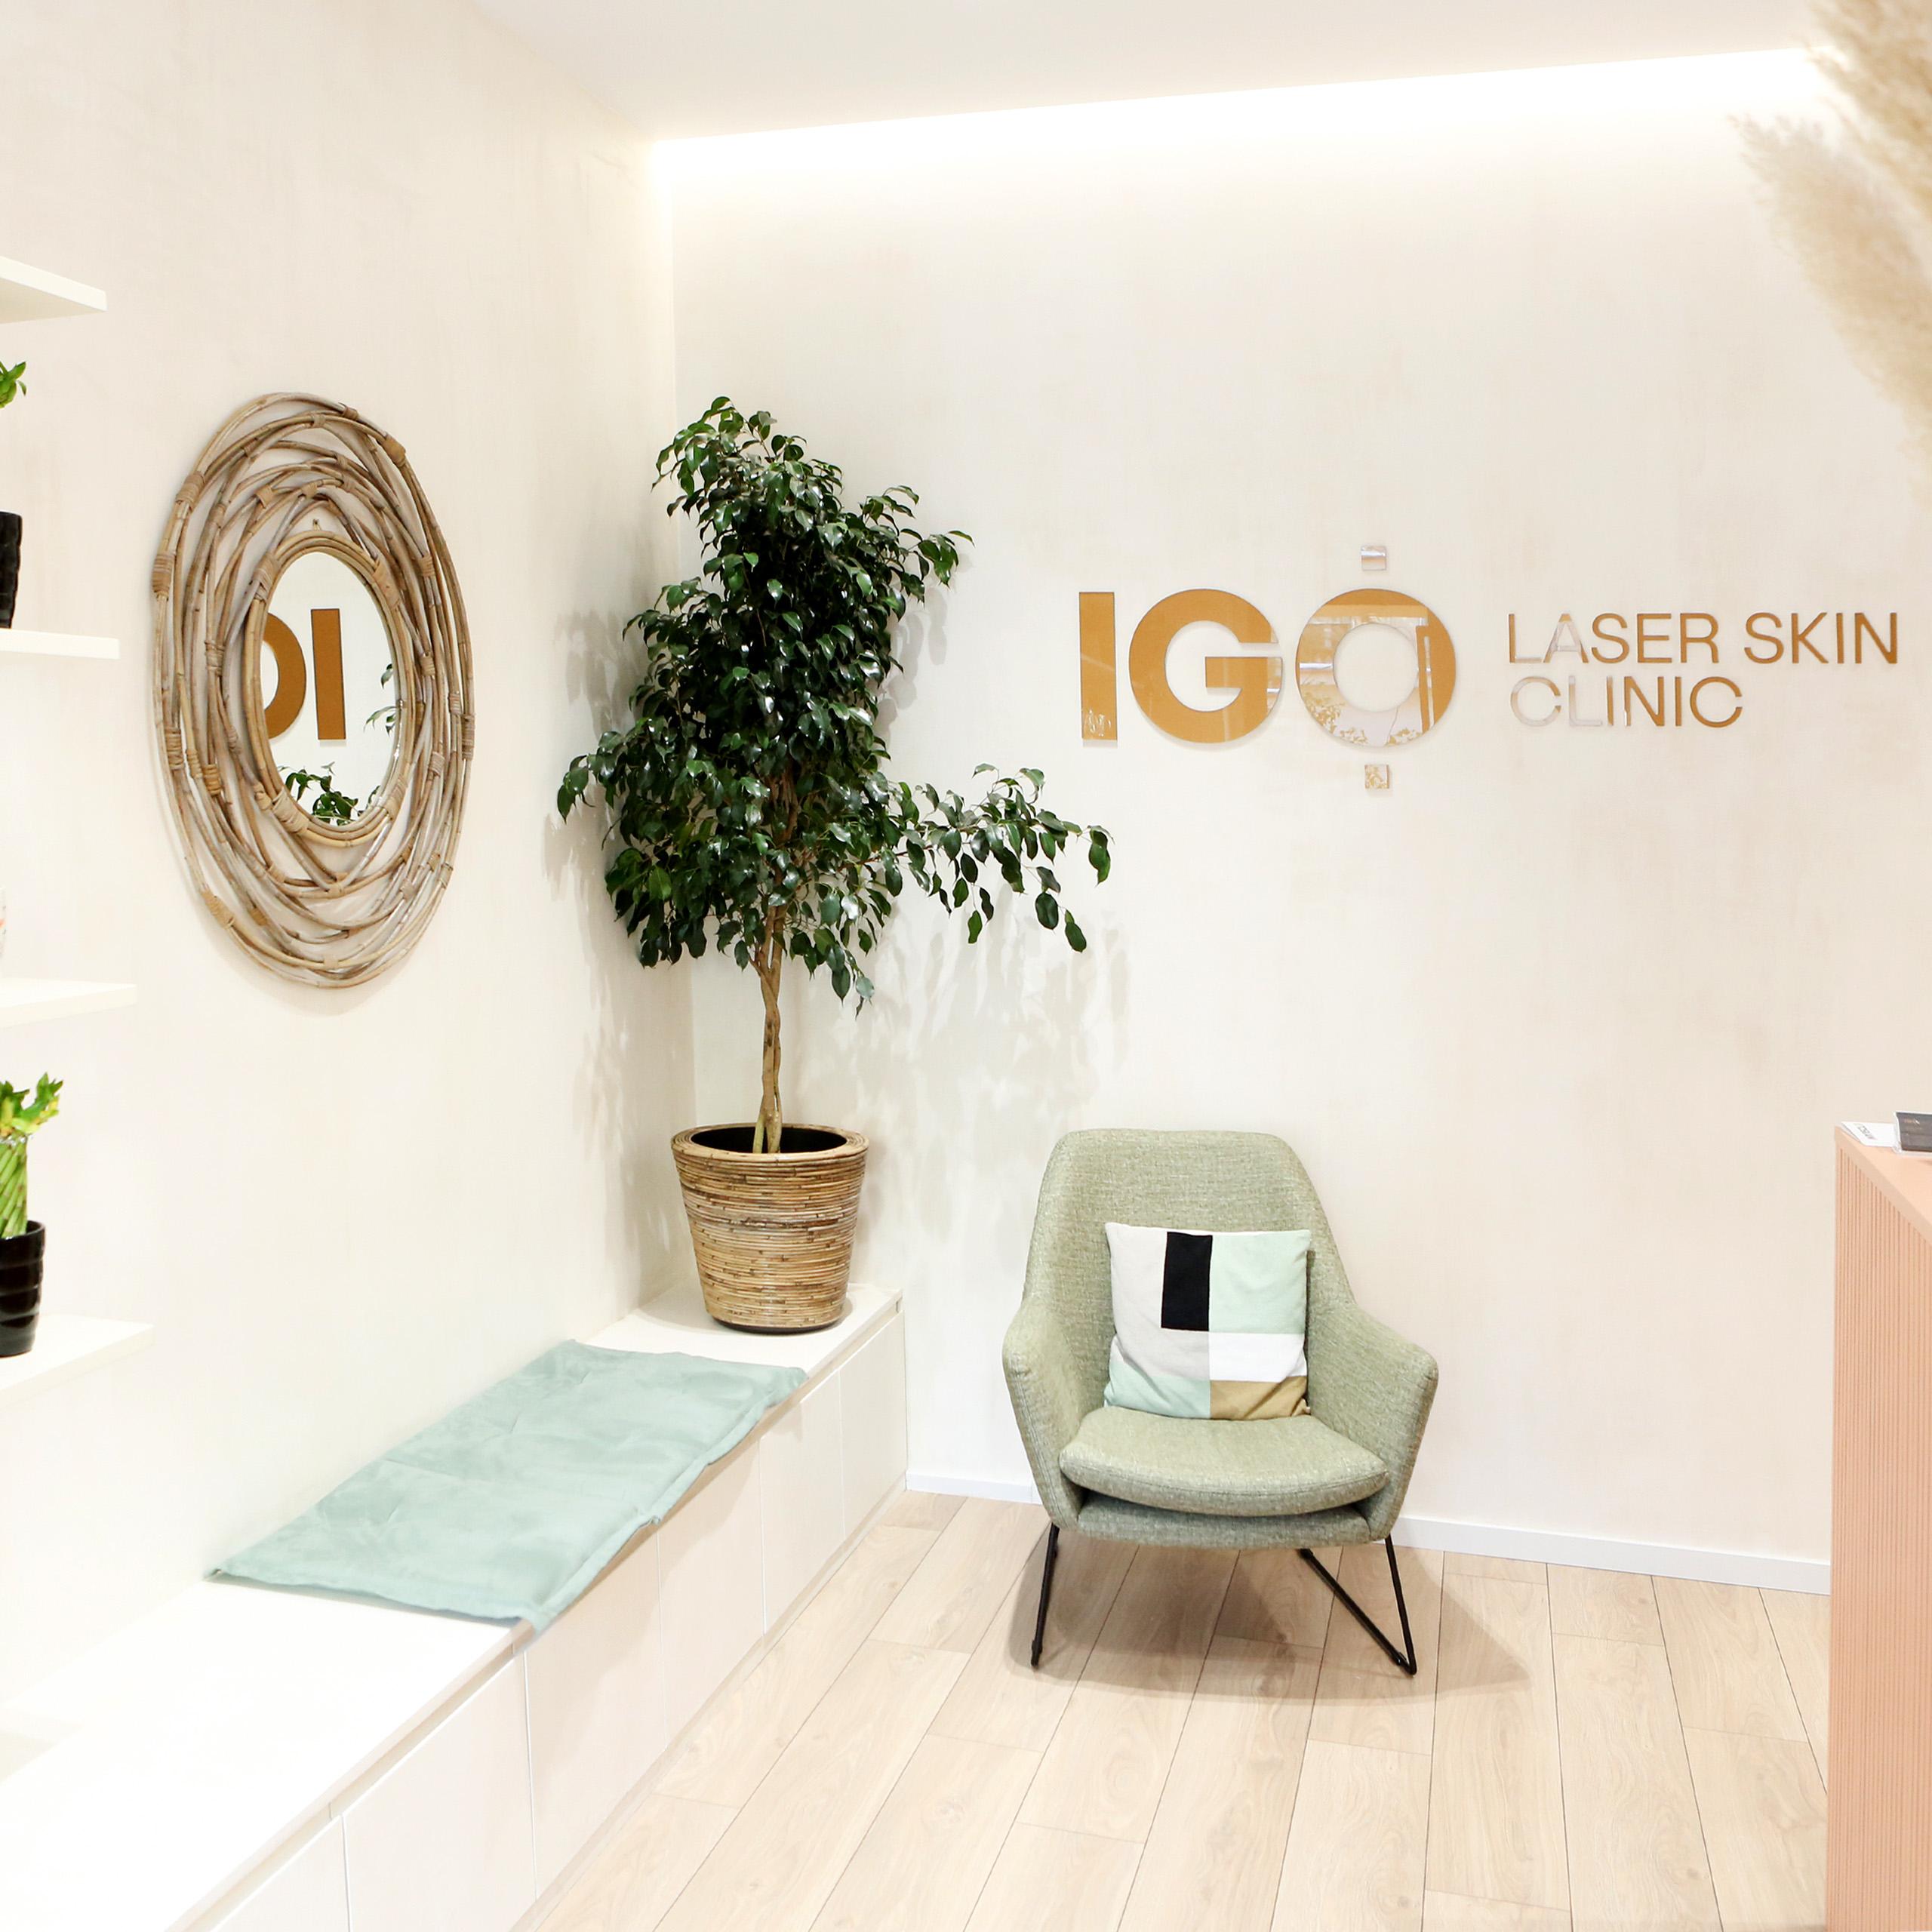 IGO Laser Skin Project Img 11 - Vatra Agency / Founder & CEO Gerton Bejo